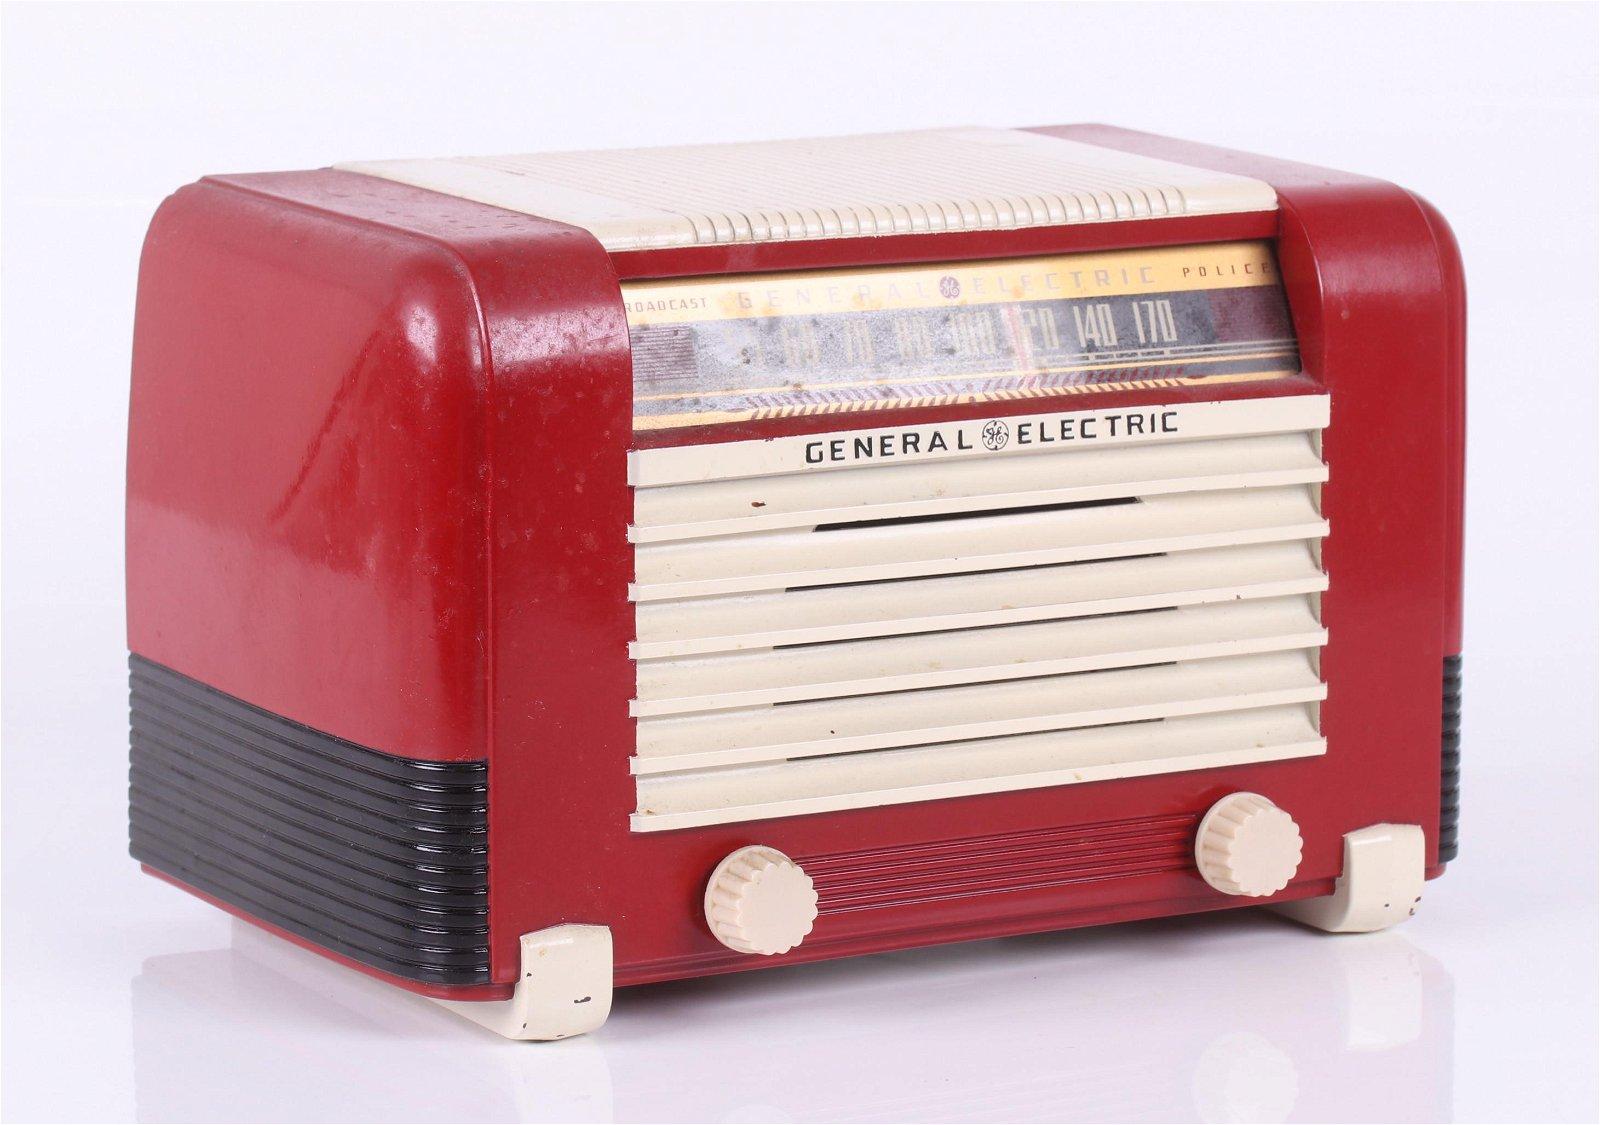 General Electric Tube Radio